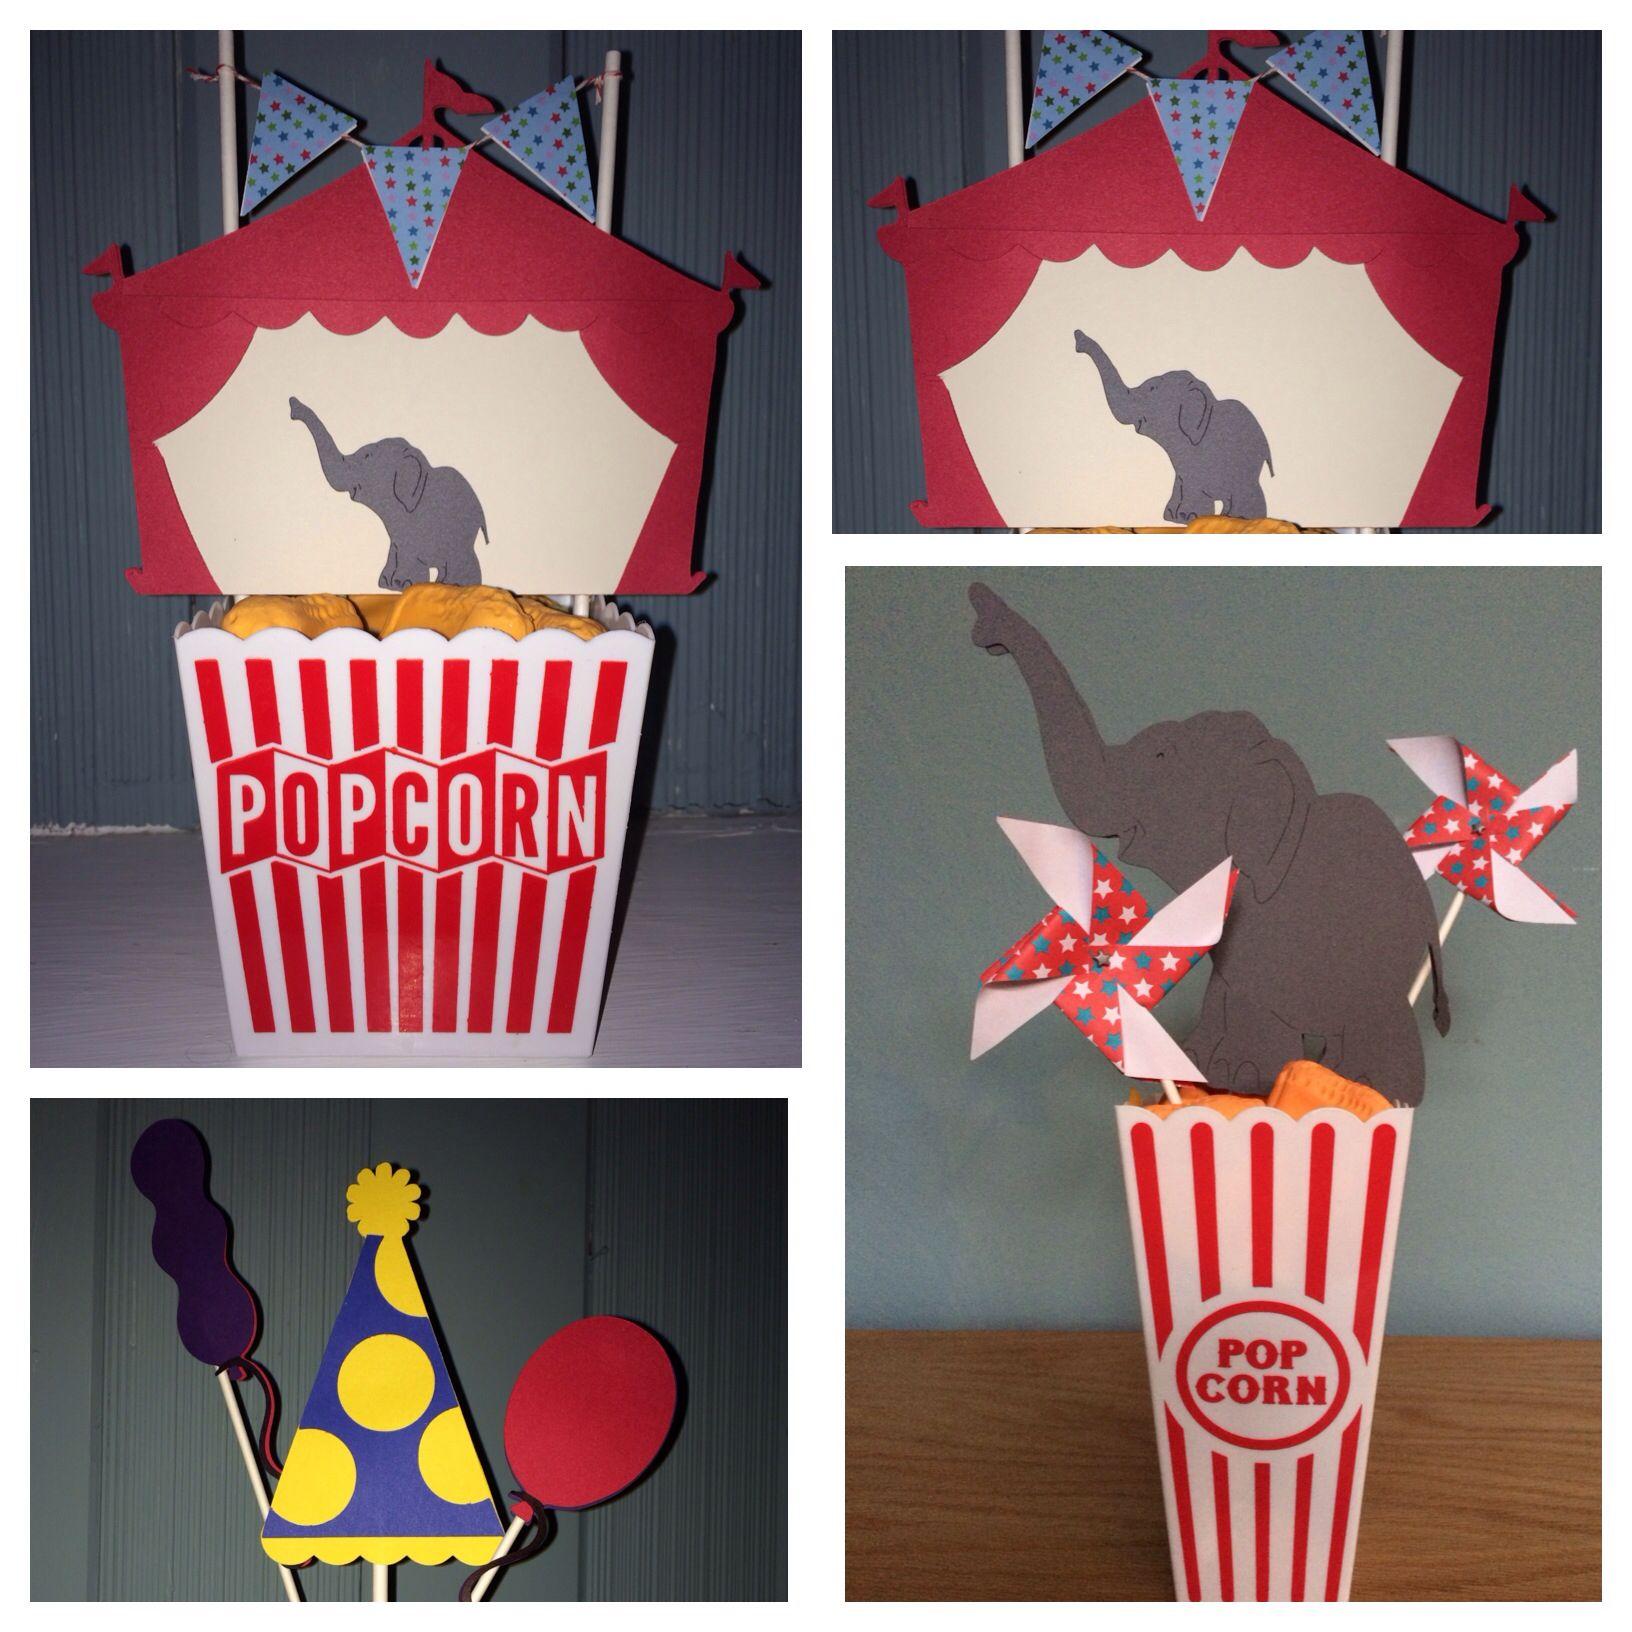 School carnival centerpieces Carnival centerpieces